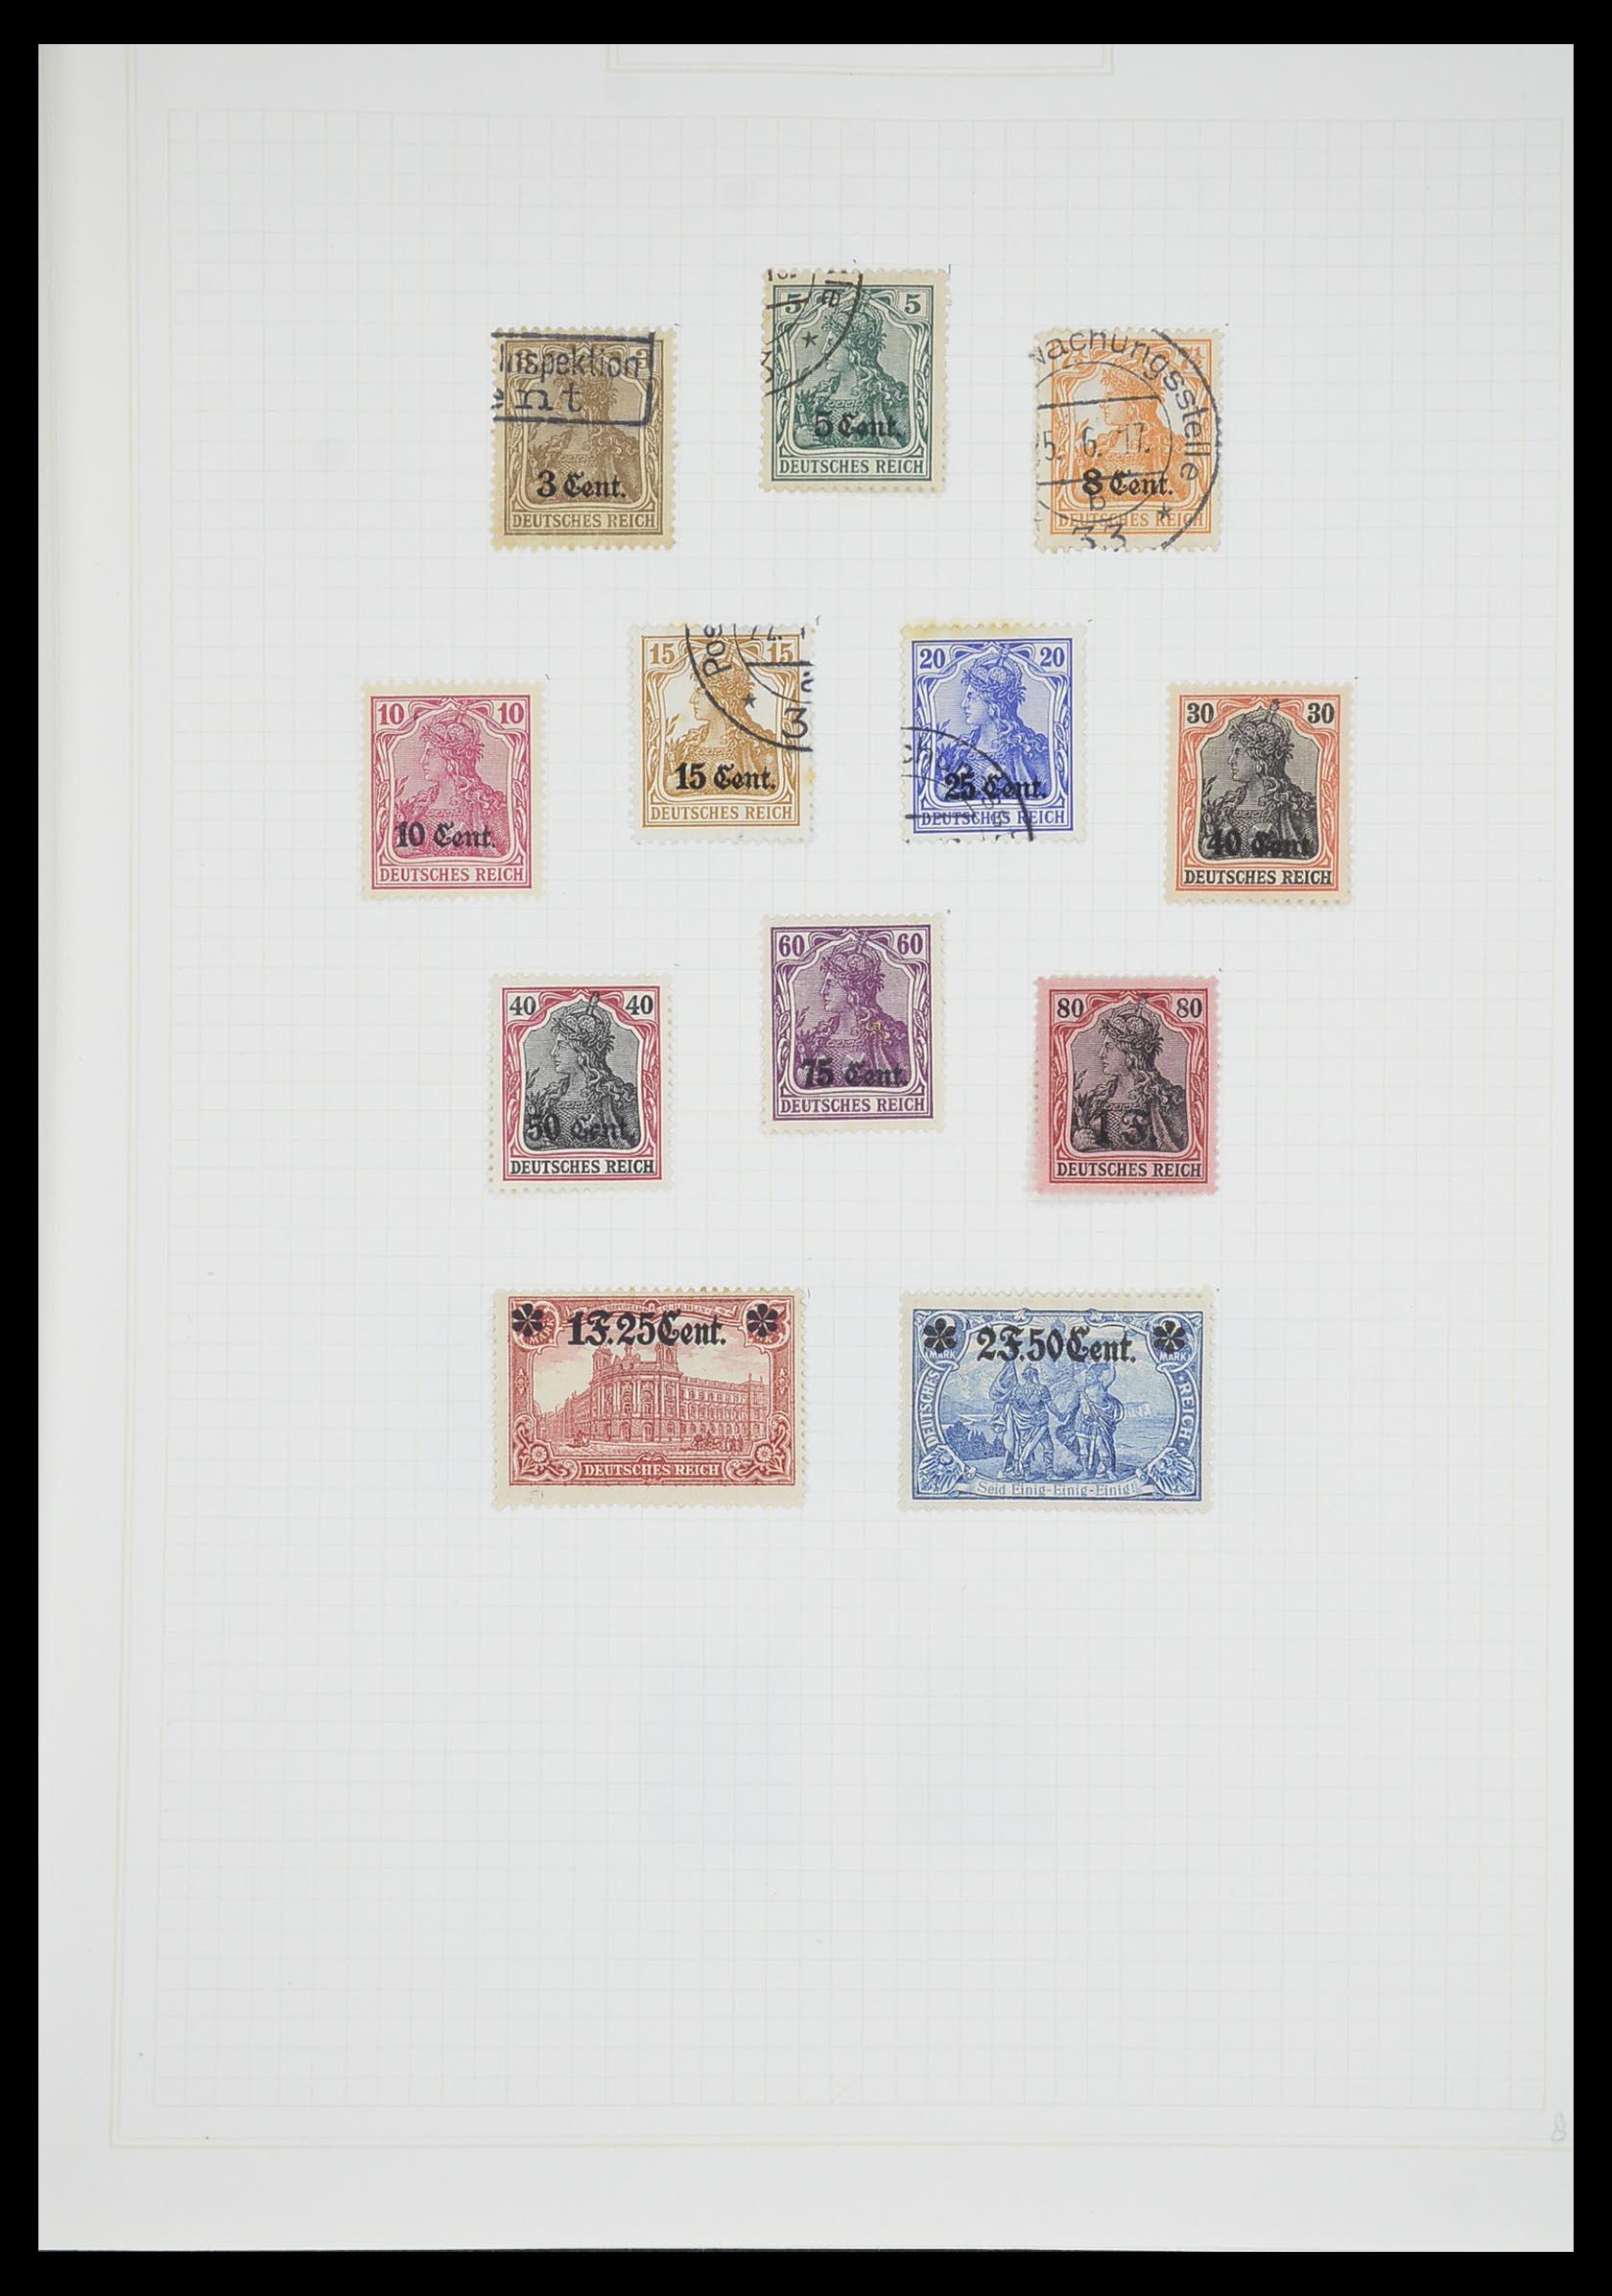 33713 003 - Postzegelverzameling 33713 Duitse bezettingen WO I en WO II 1914-1945